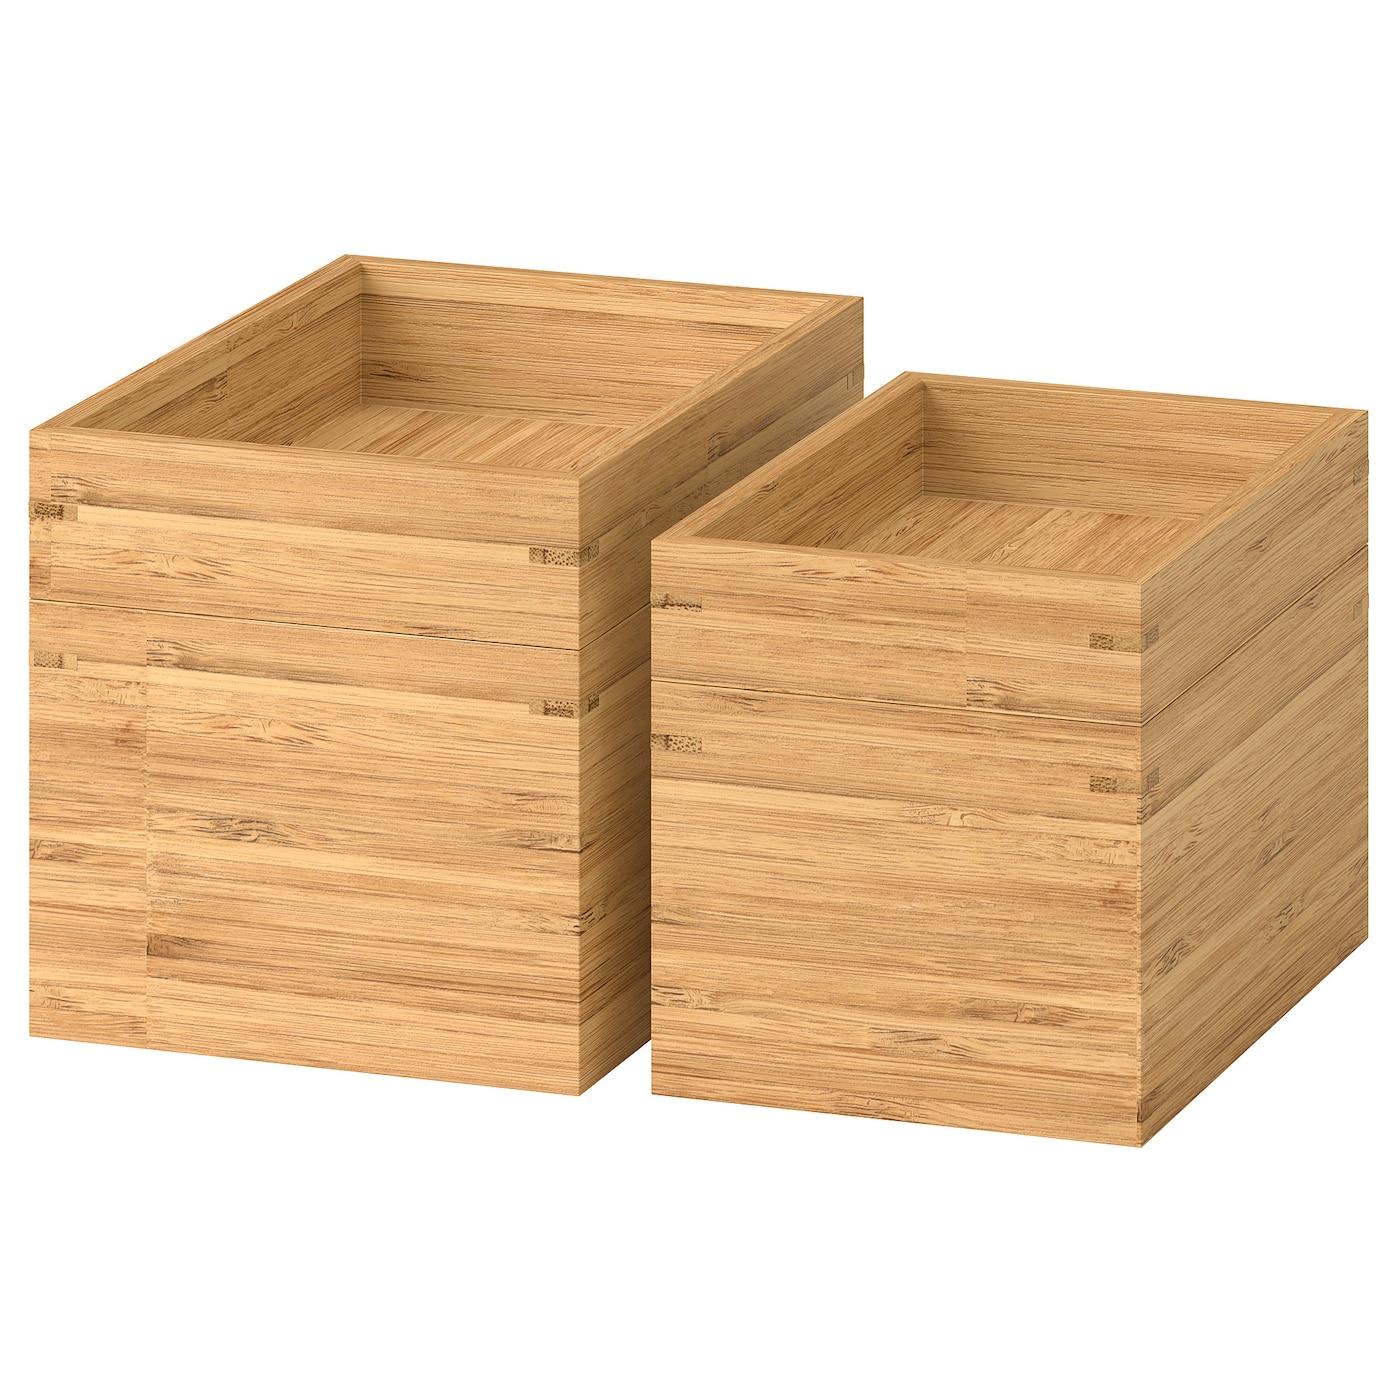 Accessoires bain, 4 pièces DRAGAN bambou